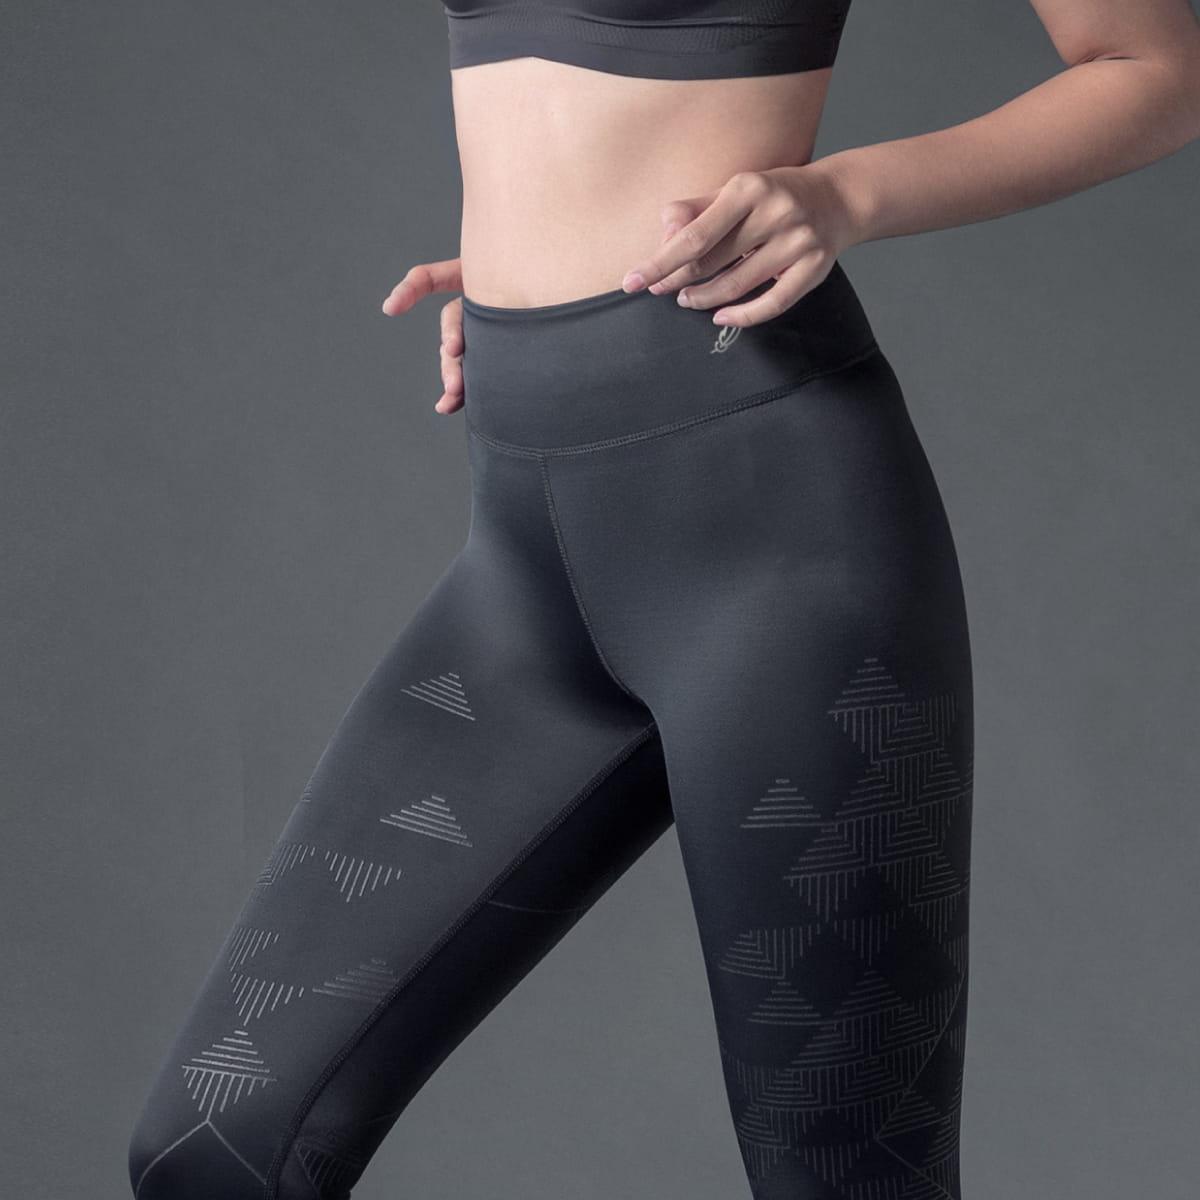 TENO超彈感美型健身褲-Mountain山稜 13